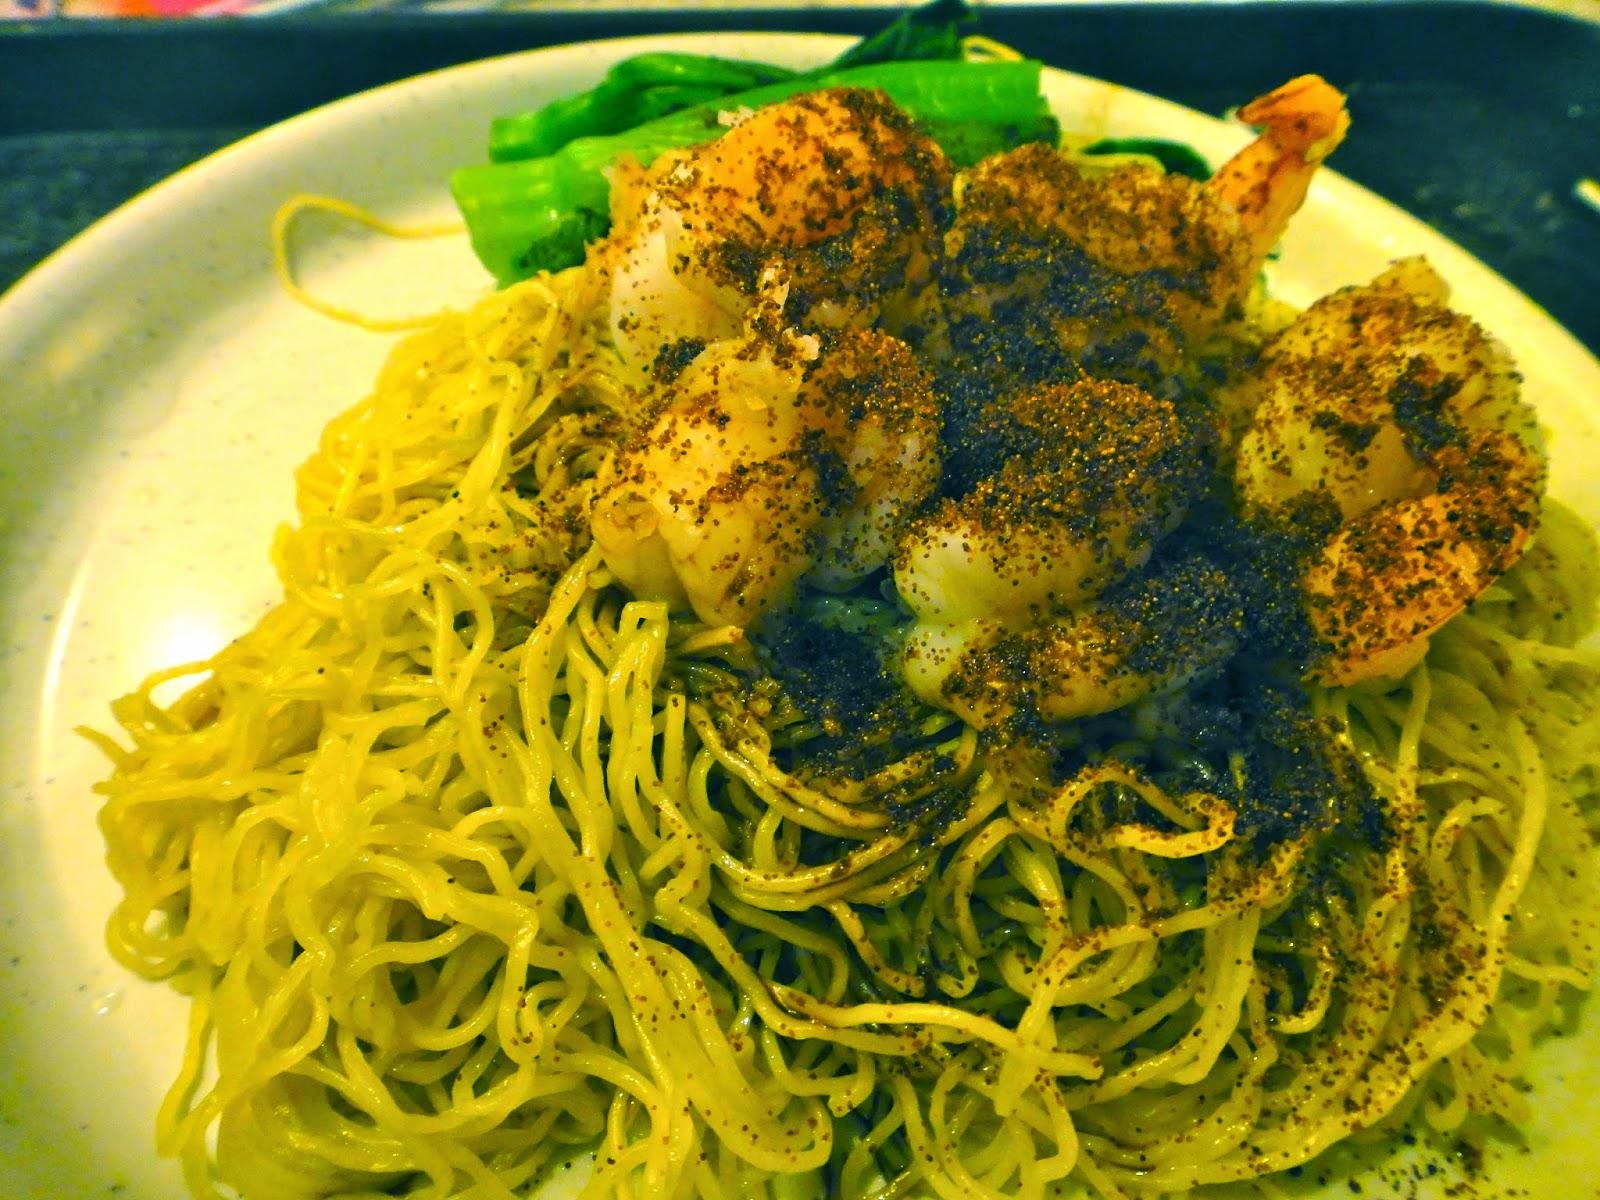 Hong Kong chili prawn noodle at The Venetian Food Court Macao